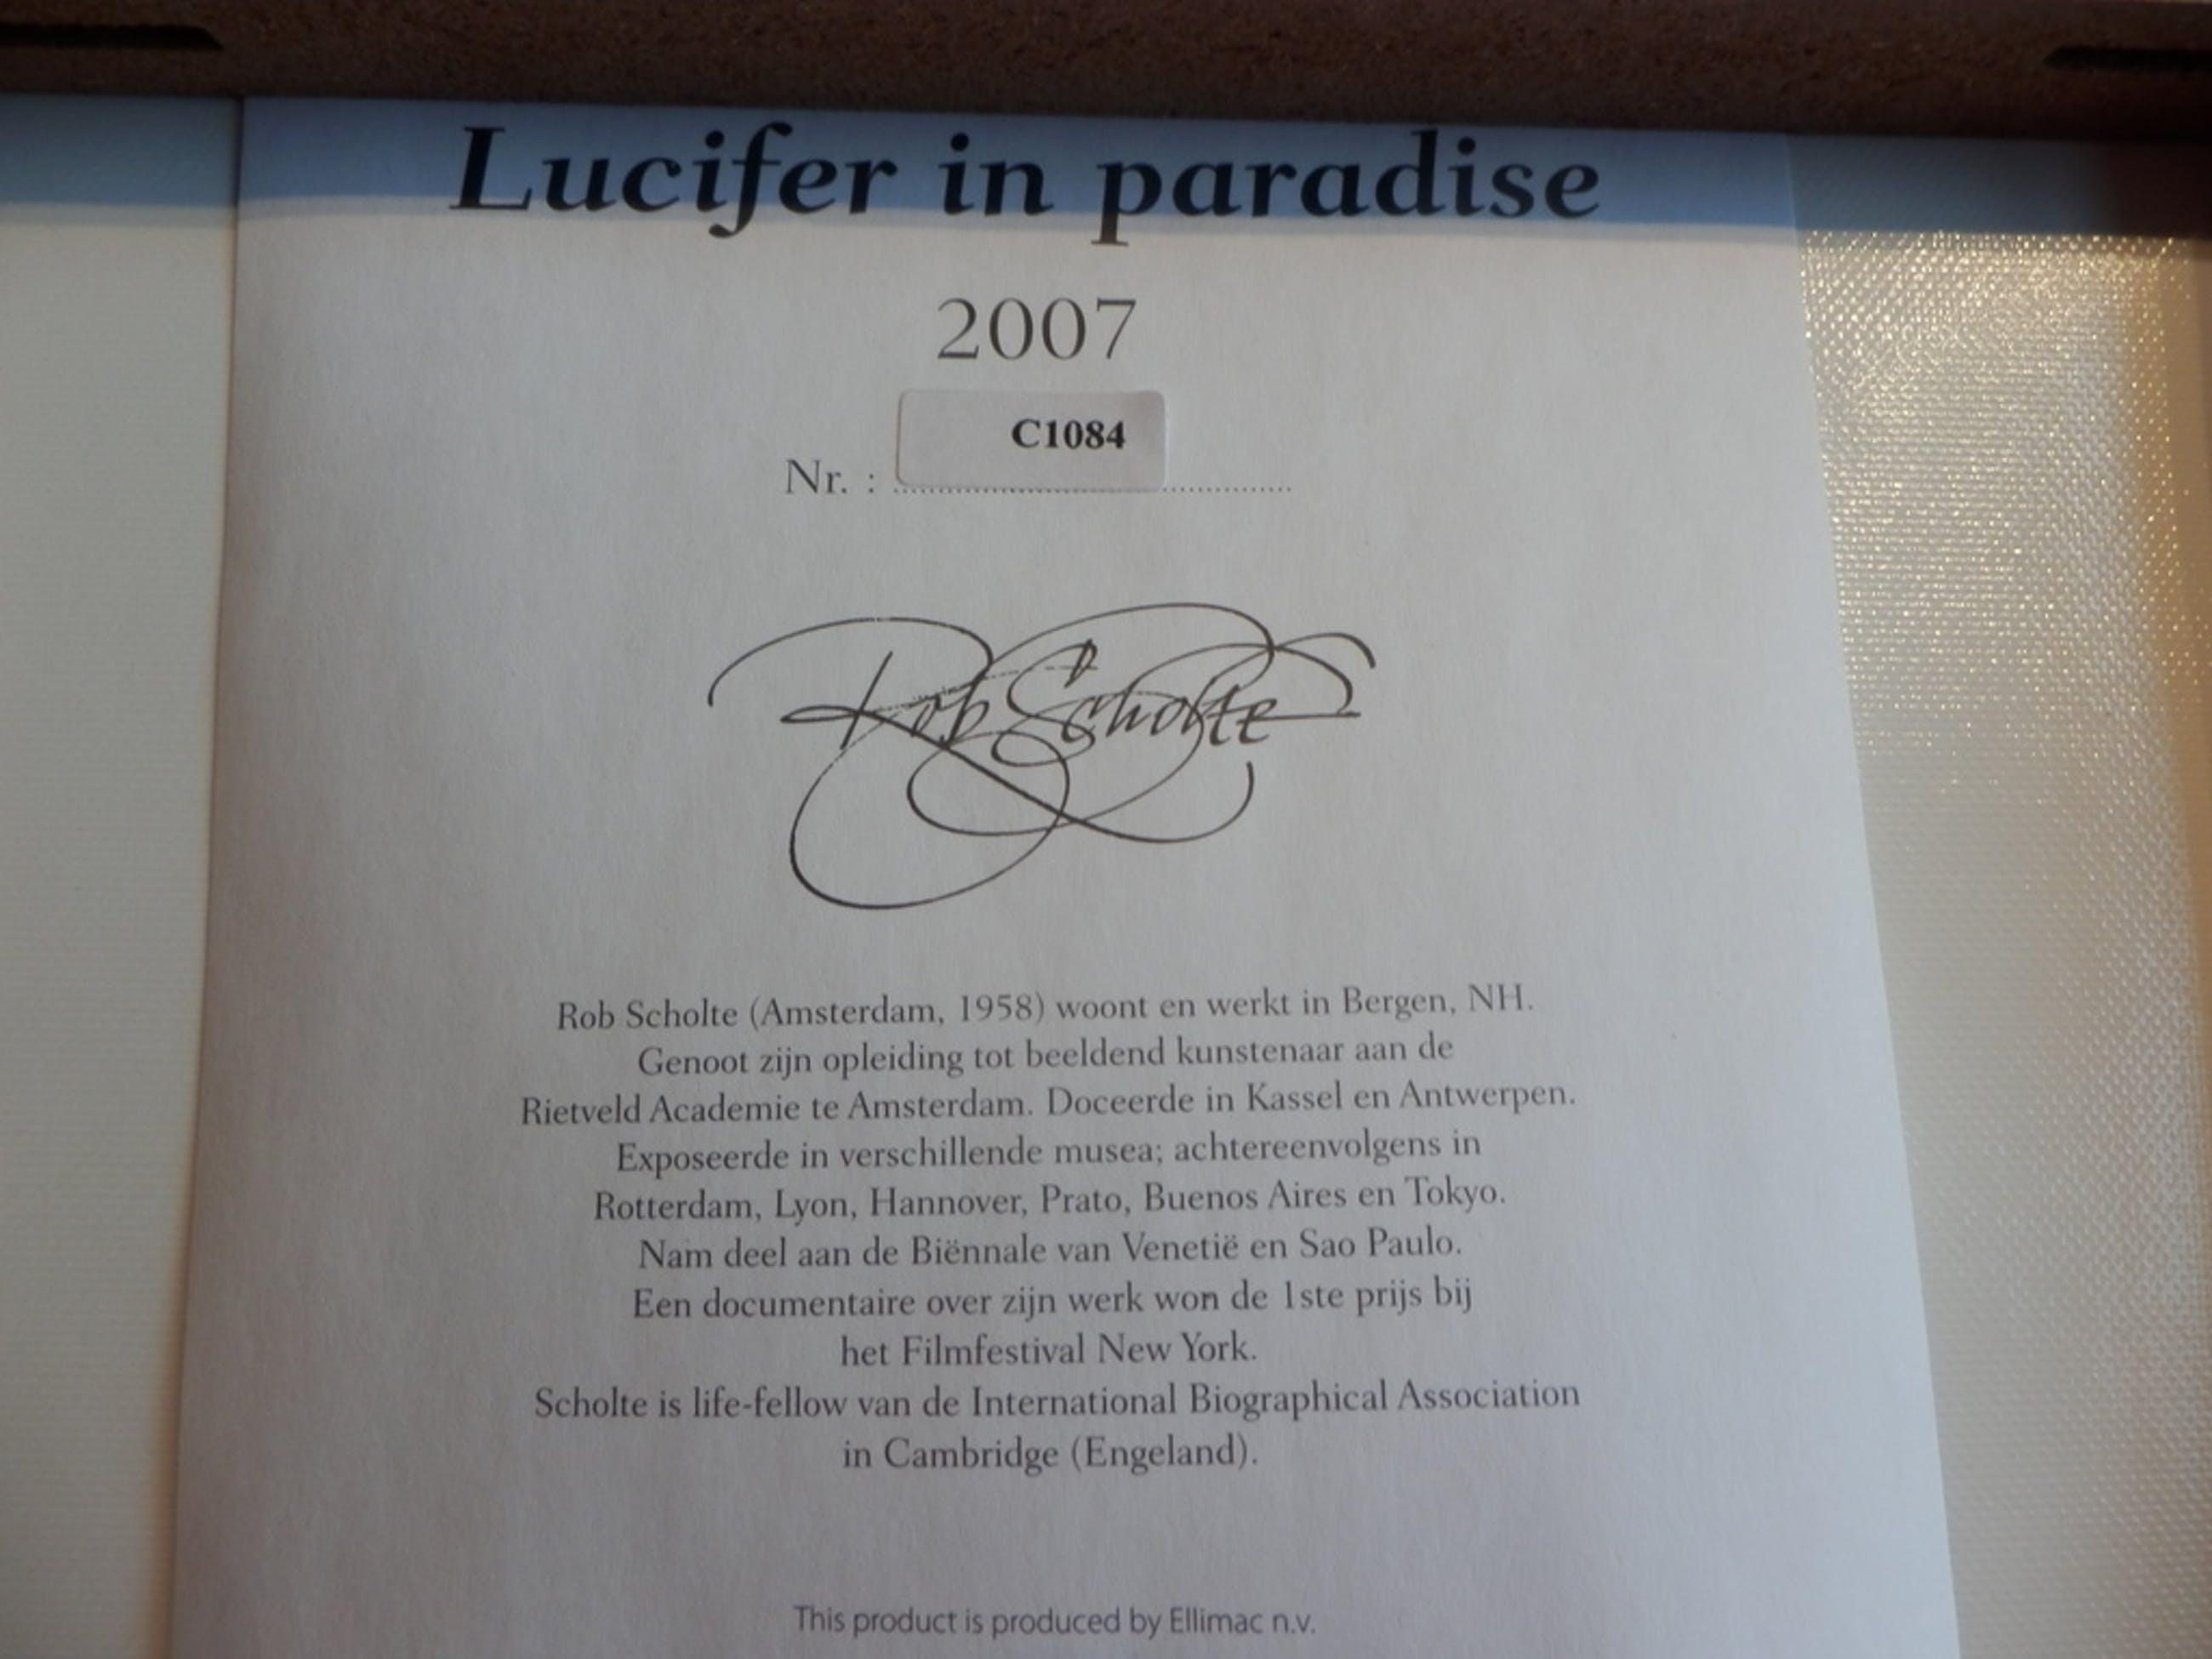 ROB SCHOLTE  Multiple  LUCIFER IN PARADISE  uit 2007  C1084 kopen? Bied vanaf 15!